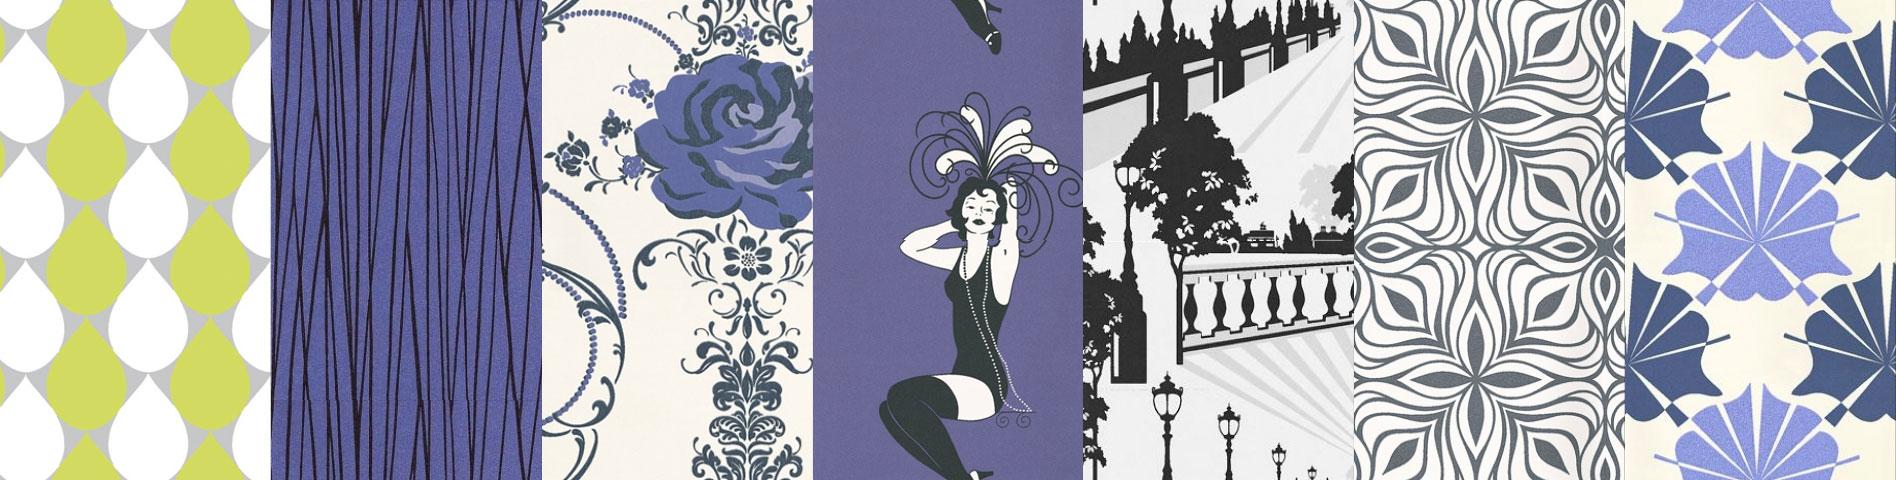 designer wallpaper 1896x480